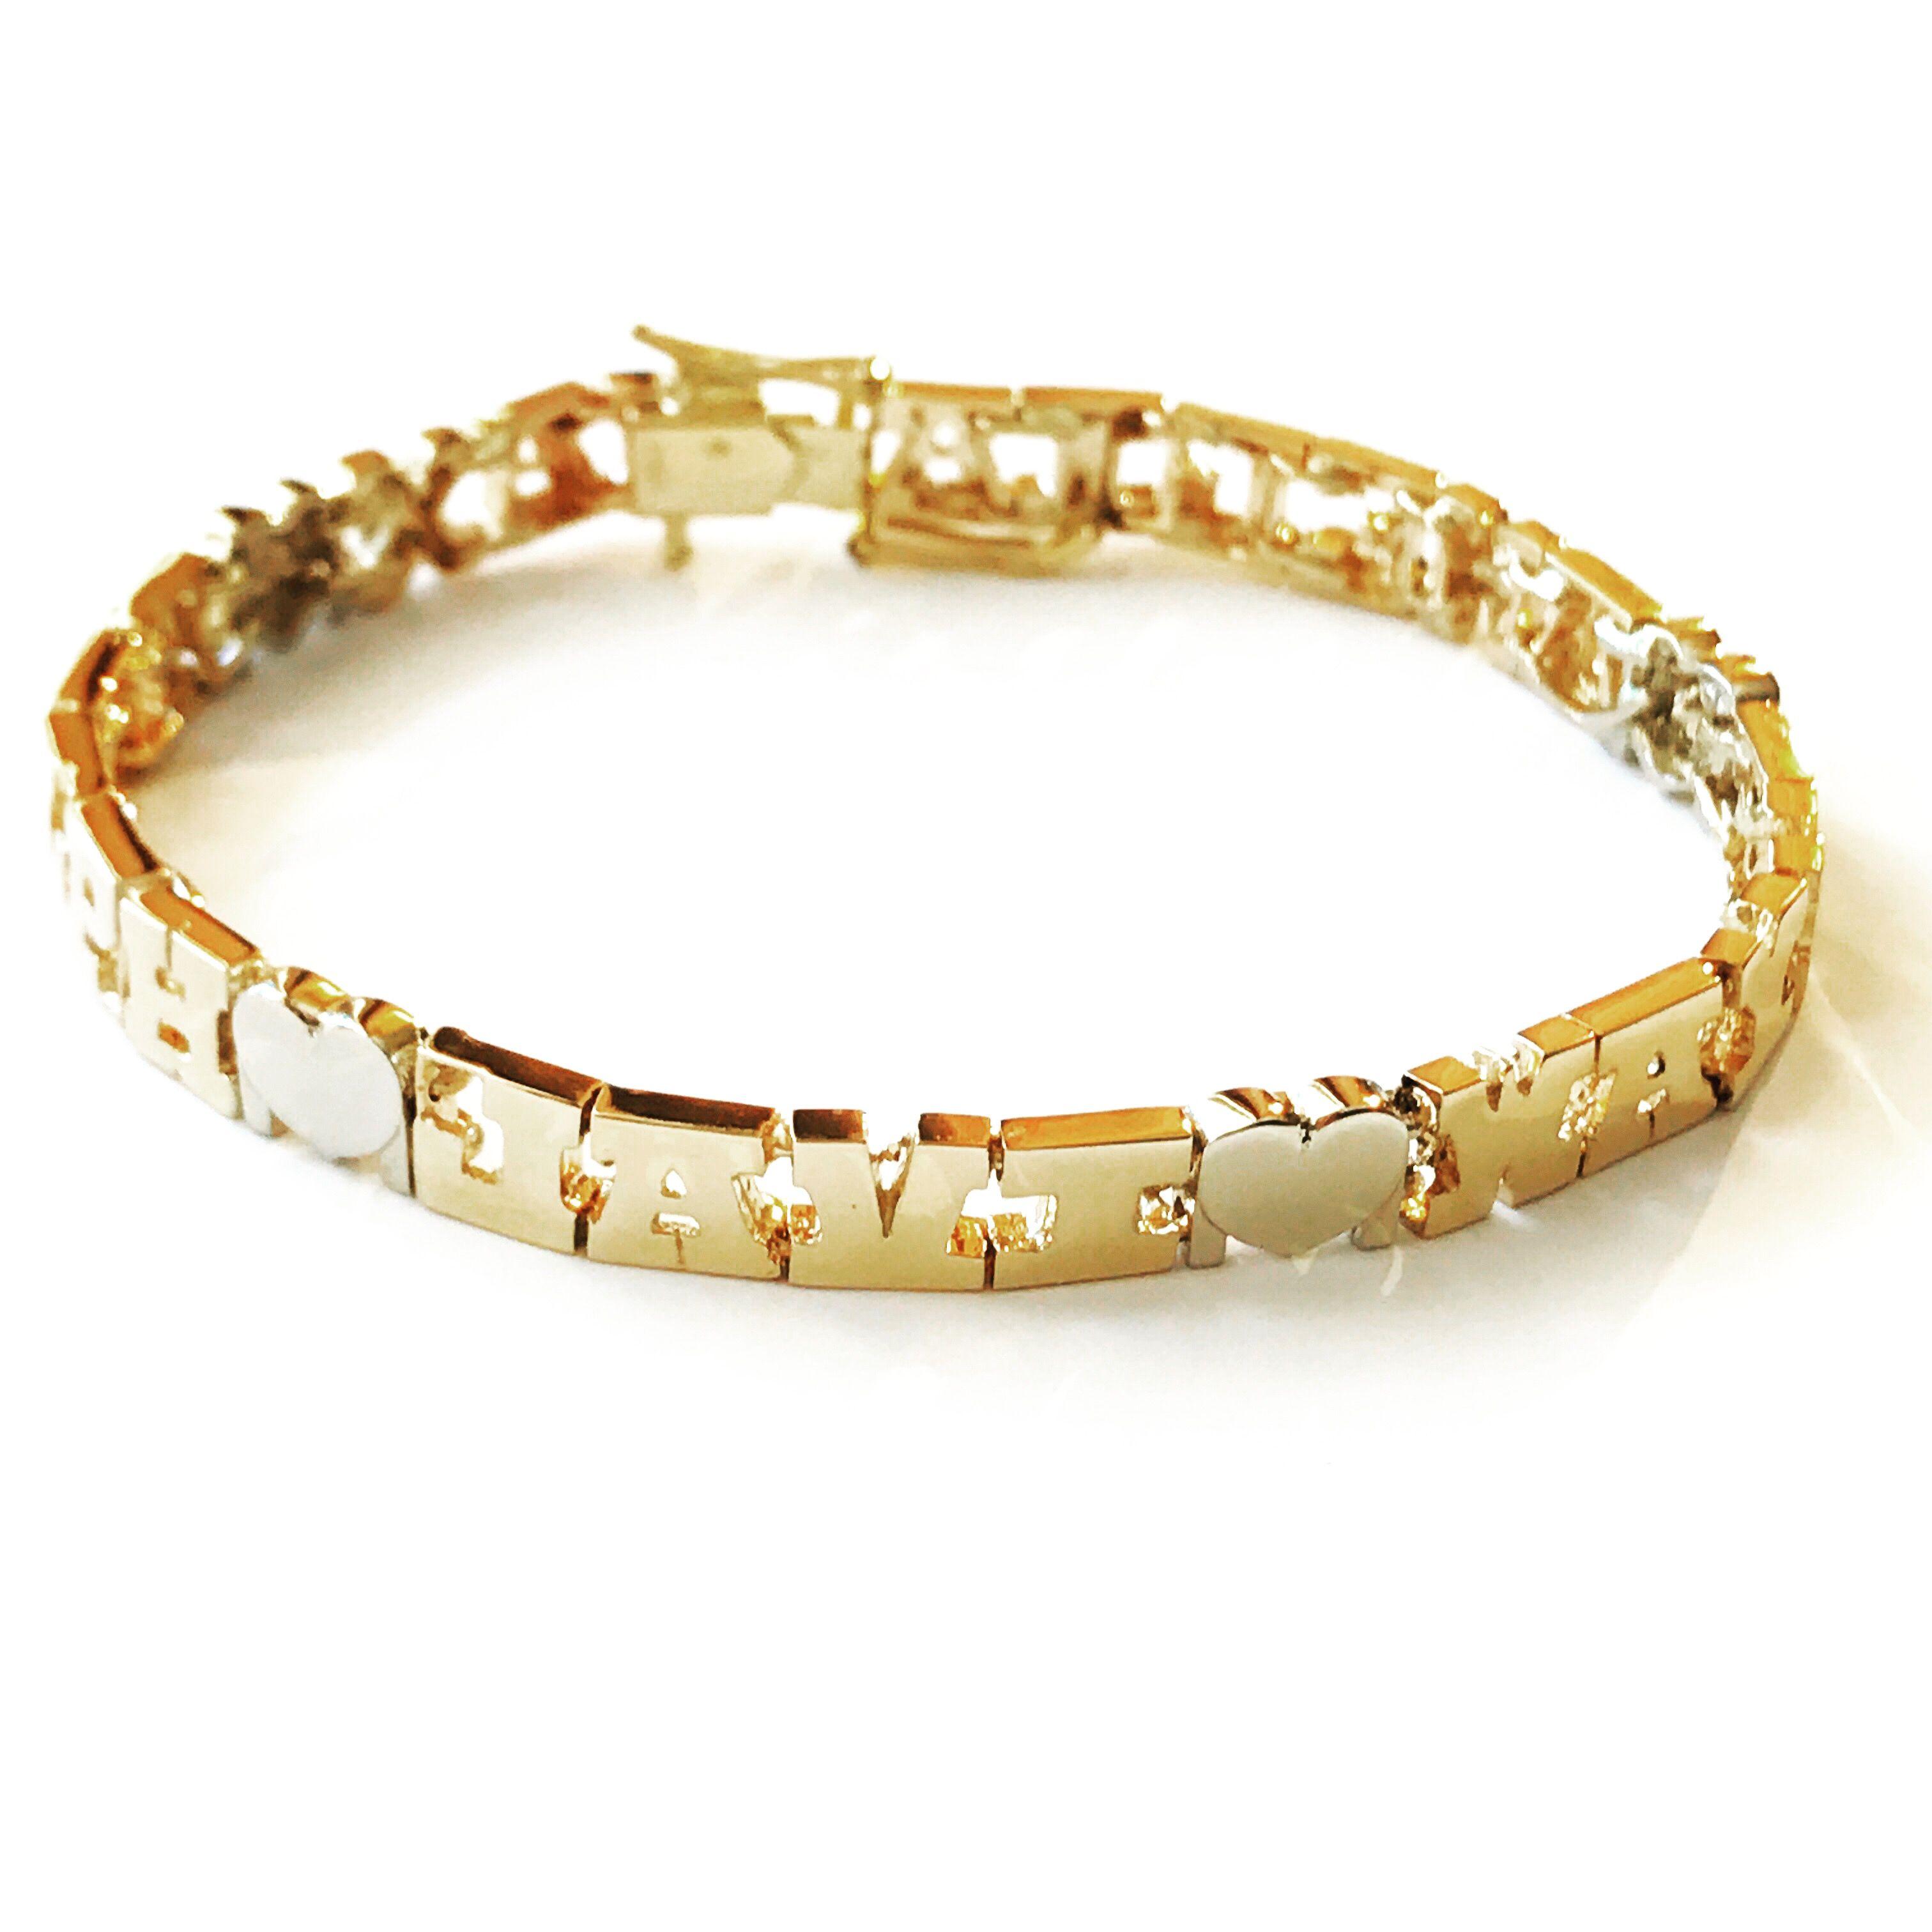 14K Gold Family Name Bracelet - Letters with Heart Separators ...